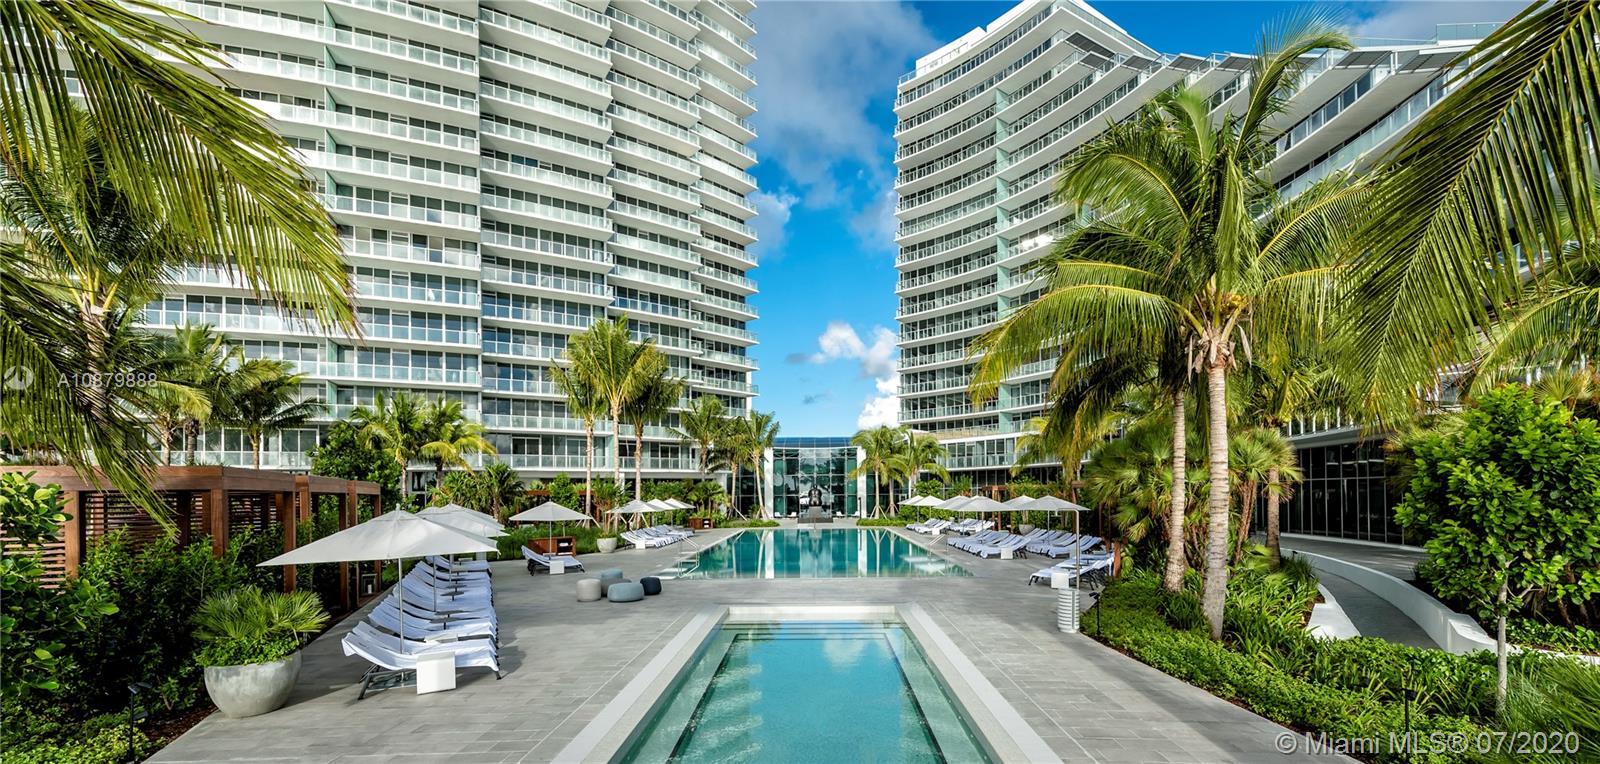 Auberge Beach Residences & Spa image #41